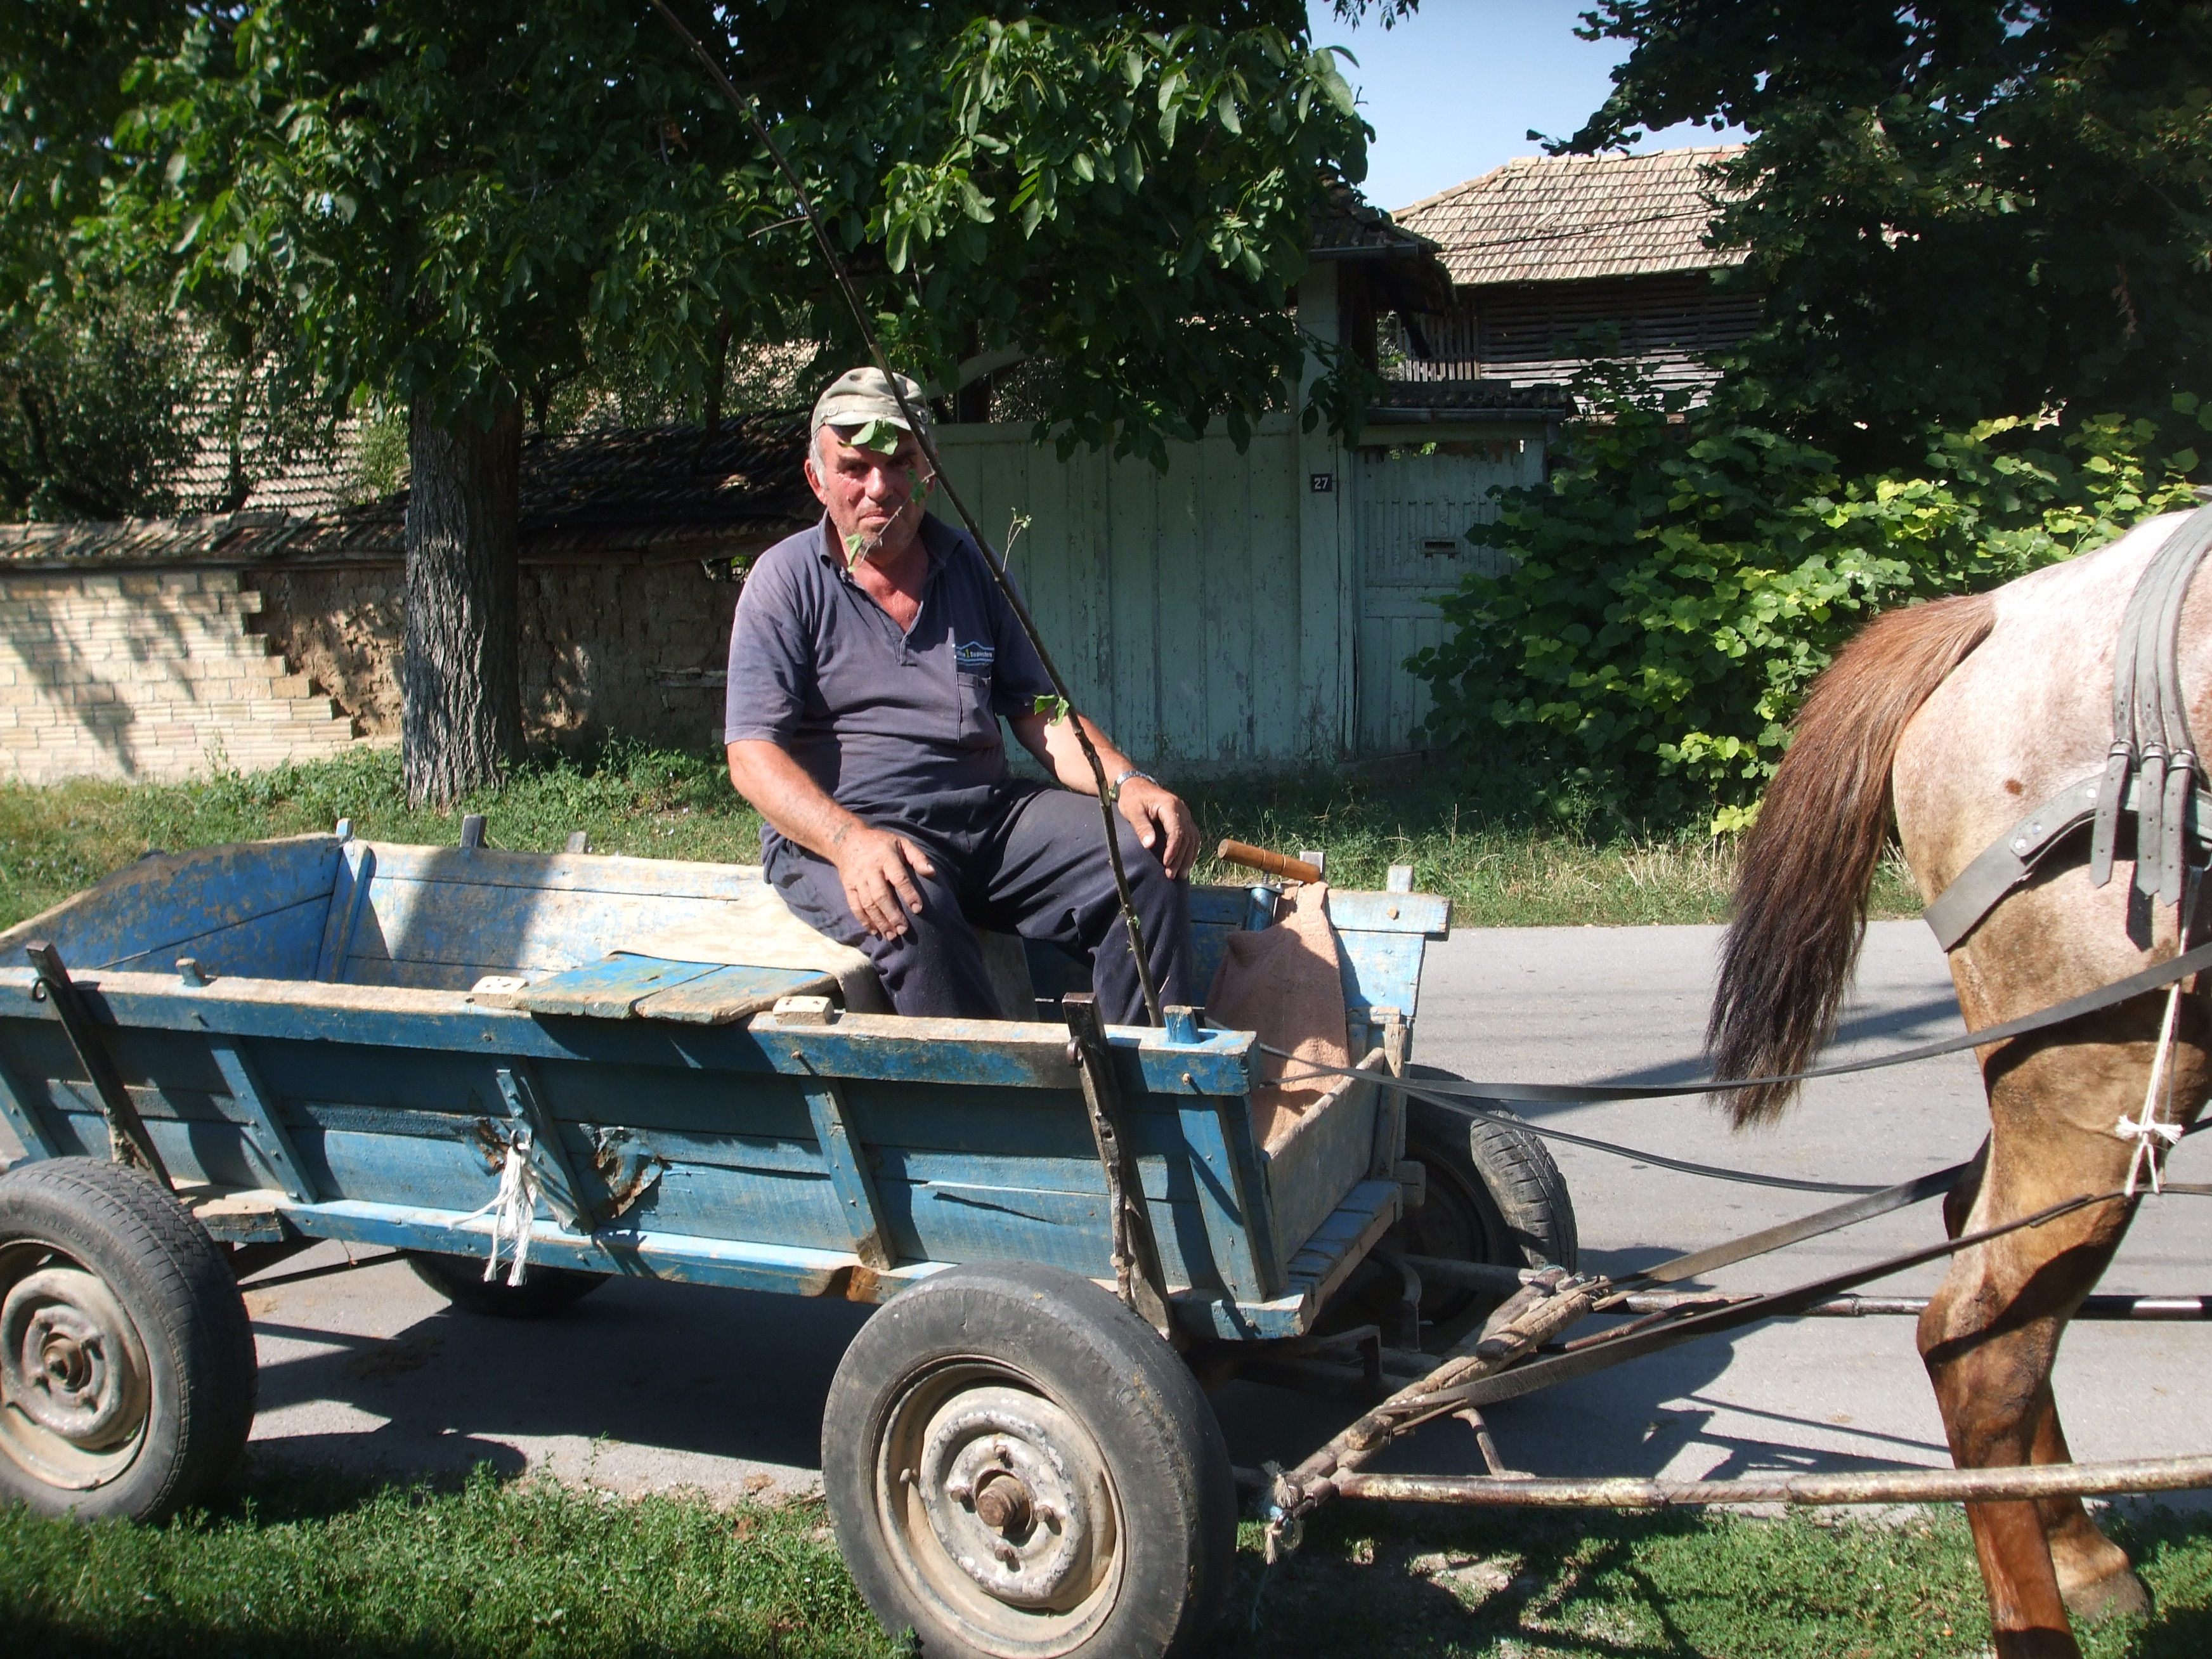 a guy on a cart